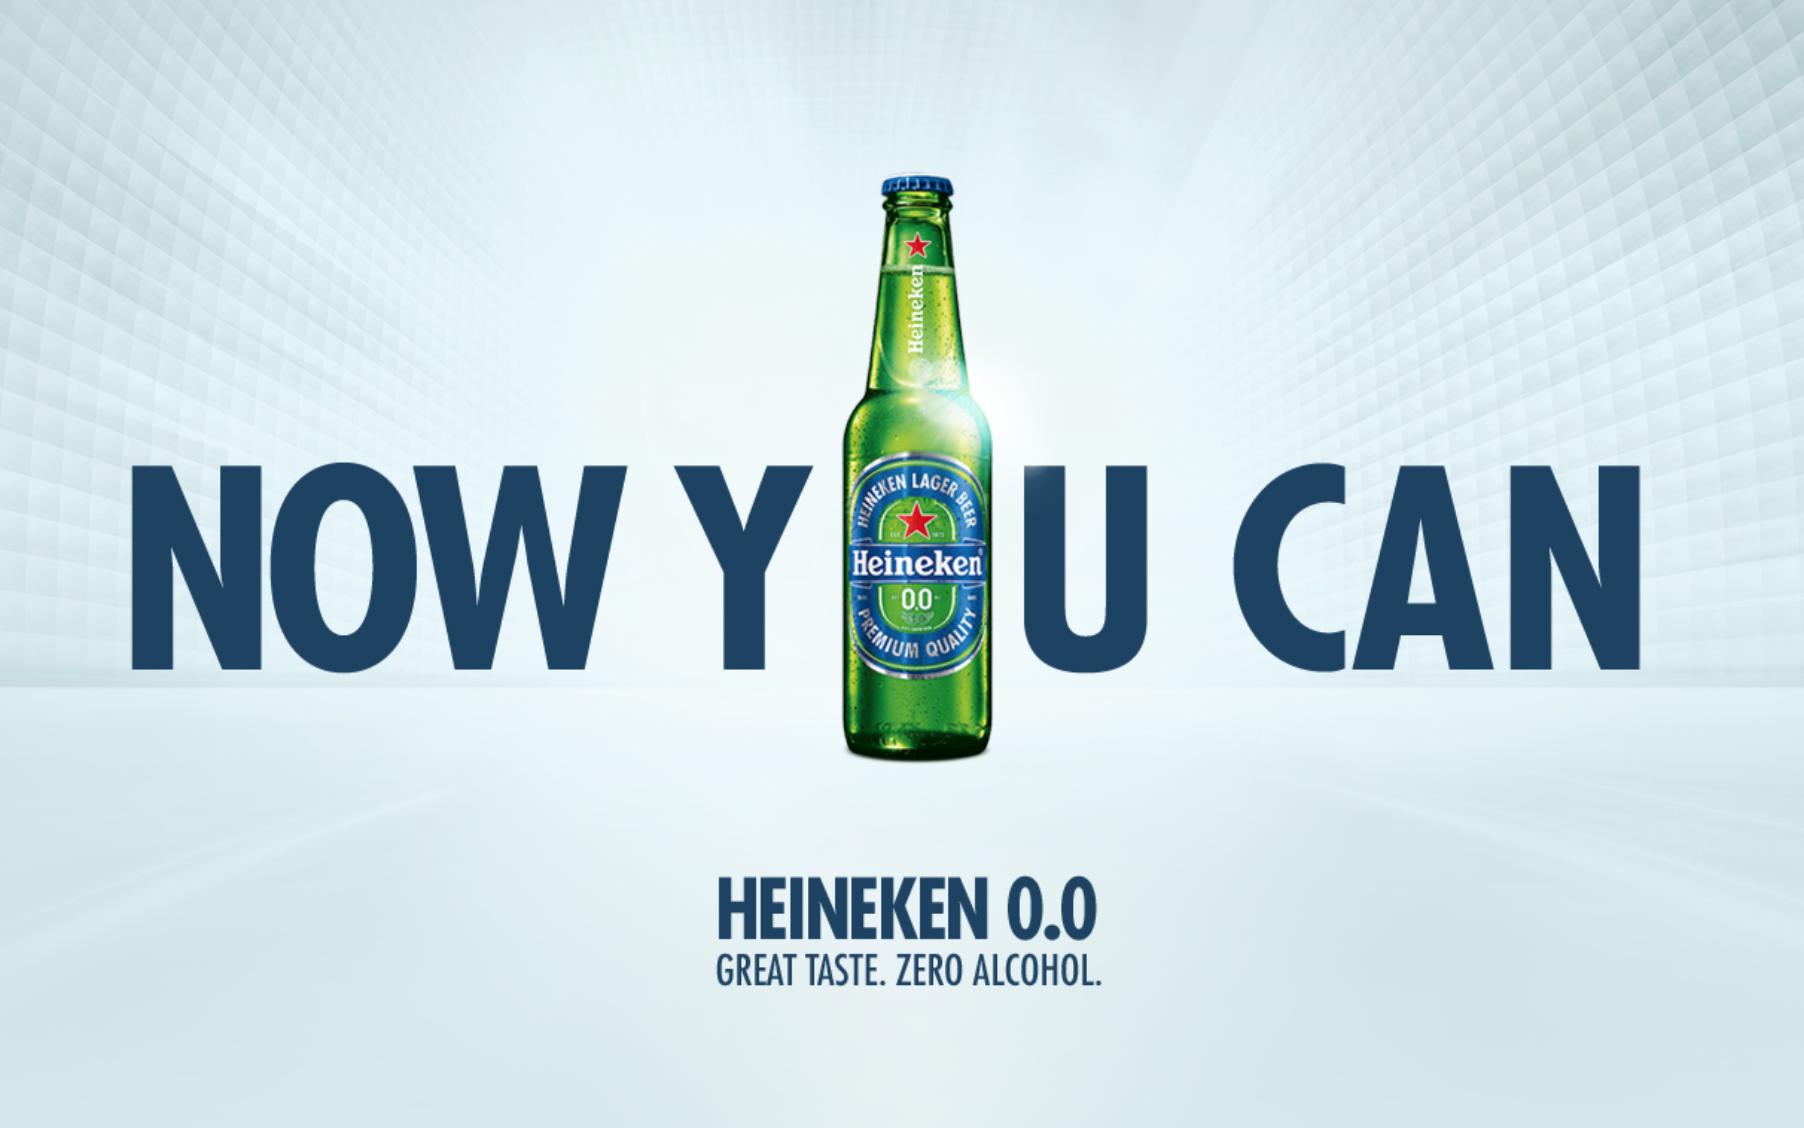 https://www.google.com/url?sa=i&url=https%3A%2F%2Fsea.mashable.com%2Farticle%2F4510%2Fwe-tried-heinekens-new-zero-alcohol-alternative-and-it-tastes-really-promising&psig=AOvVaw2Tk9_z4q8I-k5lnGjagxl1&ust=1603636067982000&source=images&cd=vfe&ved=2ahUKEwio_NuCuM3sAhVVhXIEHZqmBHQQjRx6BAgAEAc